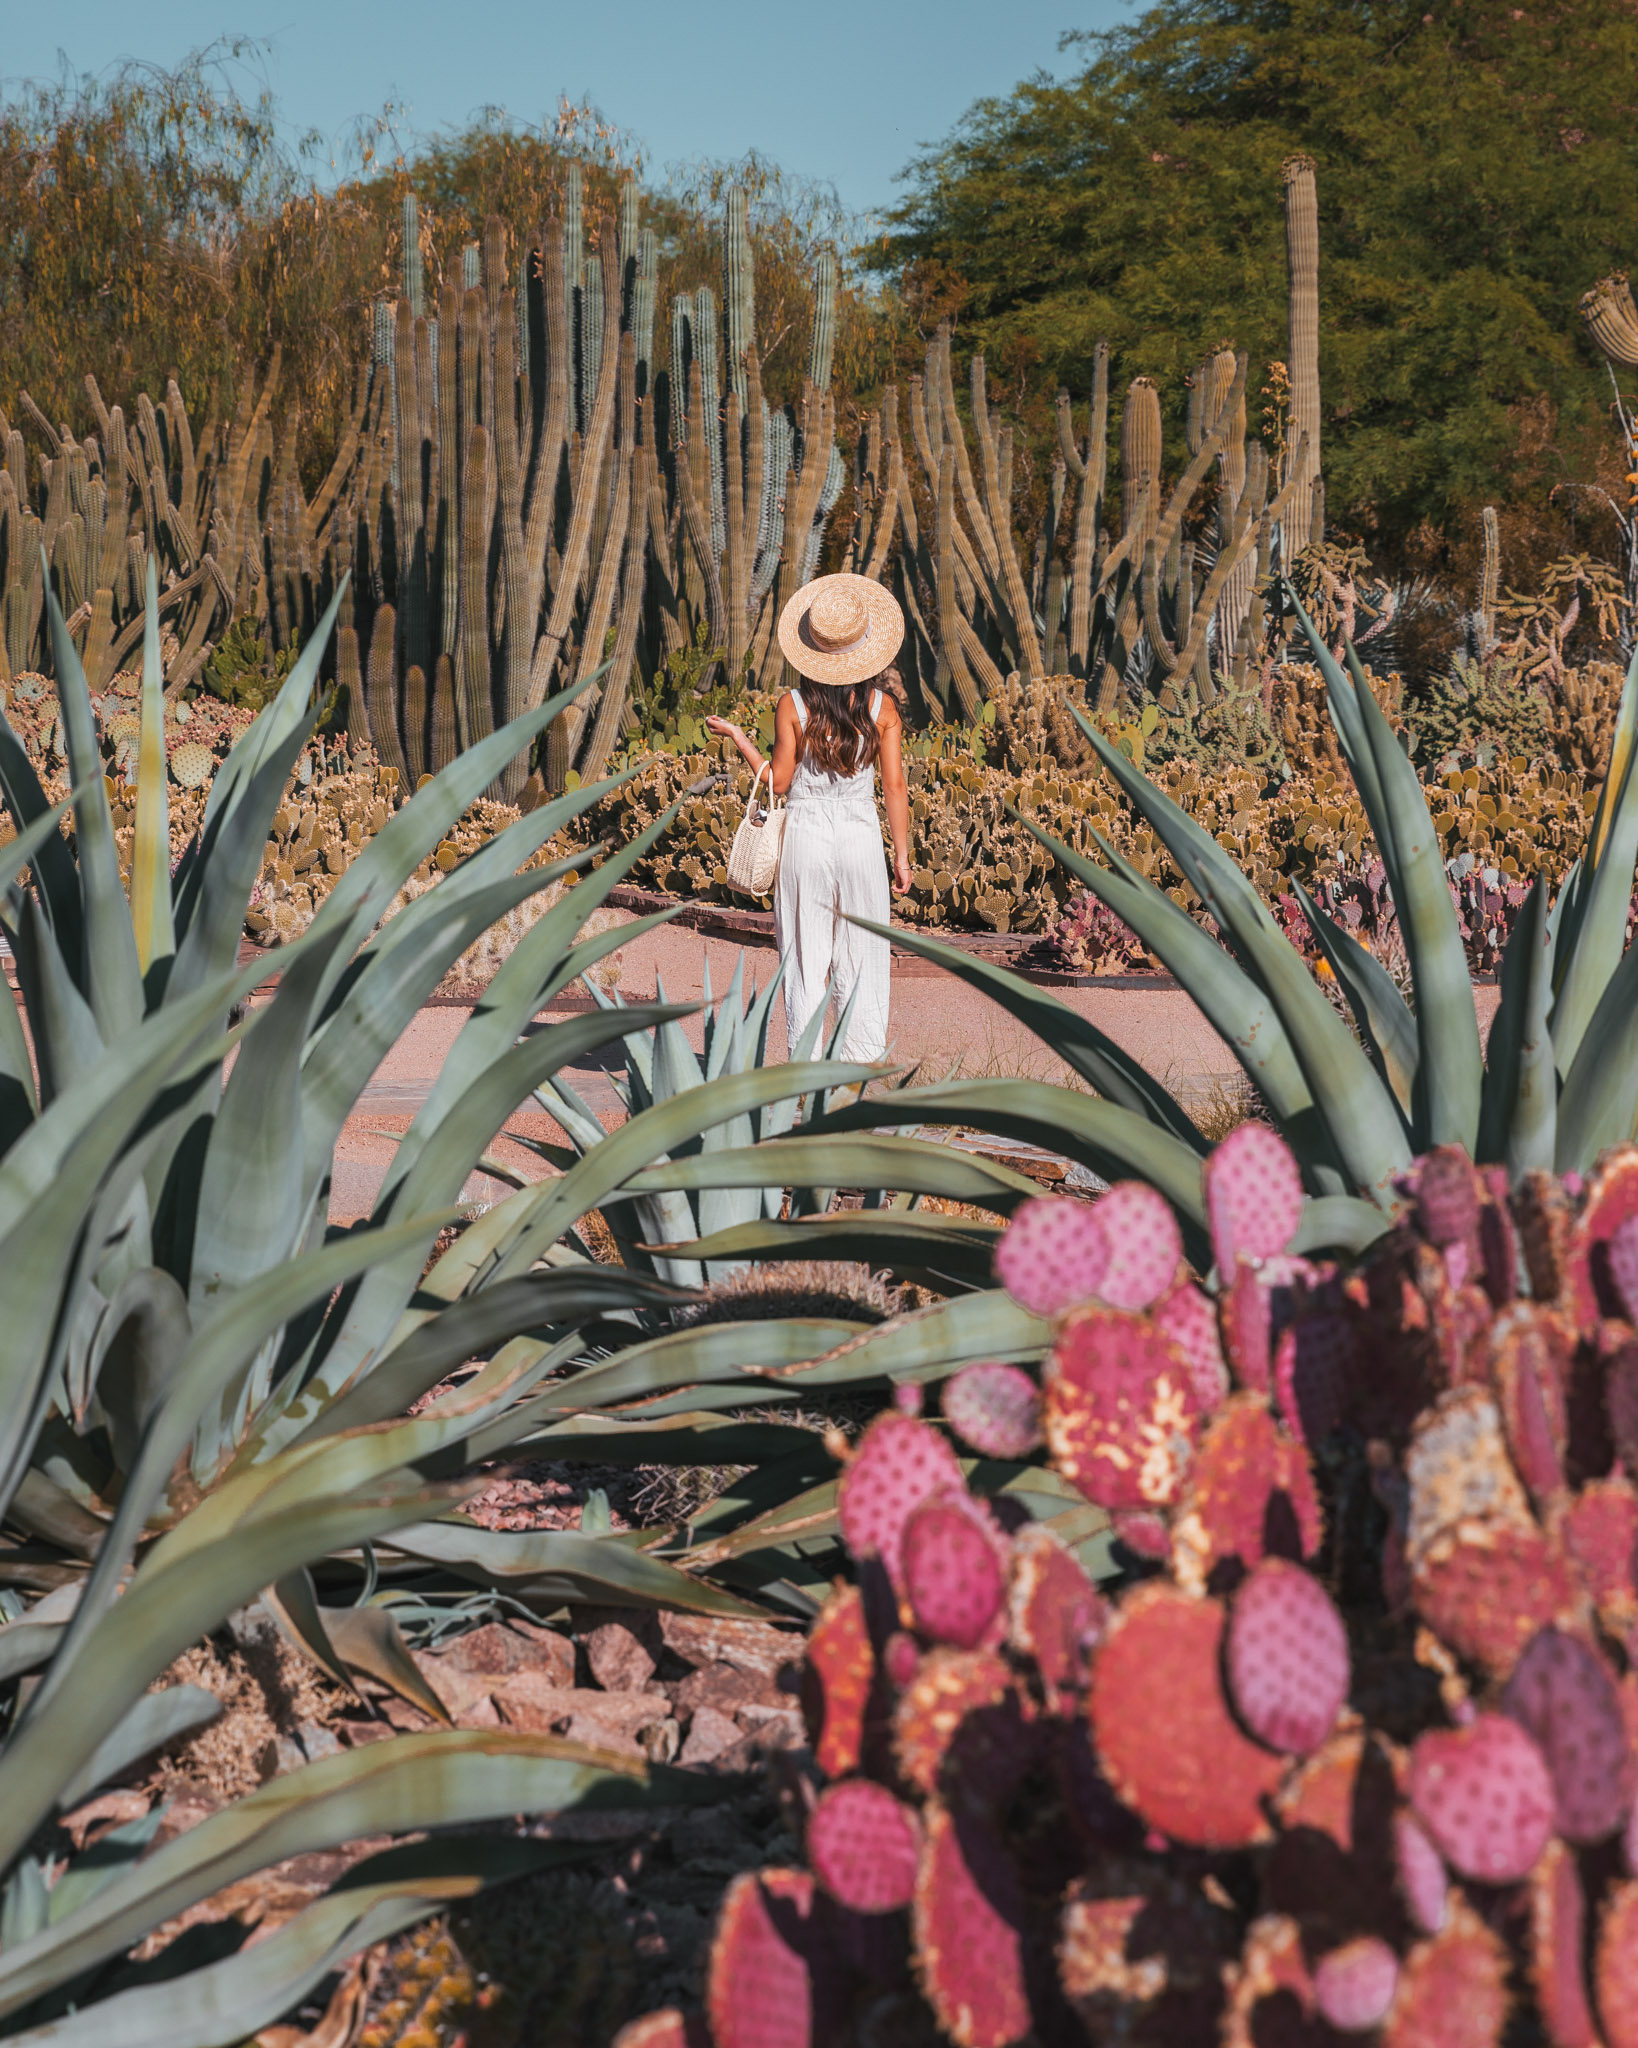 Cacti at the Desert Botanical Garden ~ The Quick Guide to Tempe, Arizona